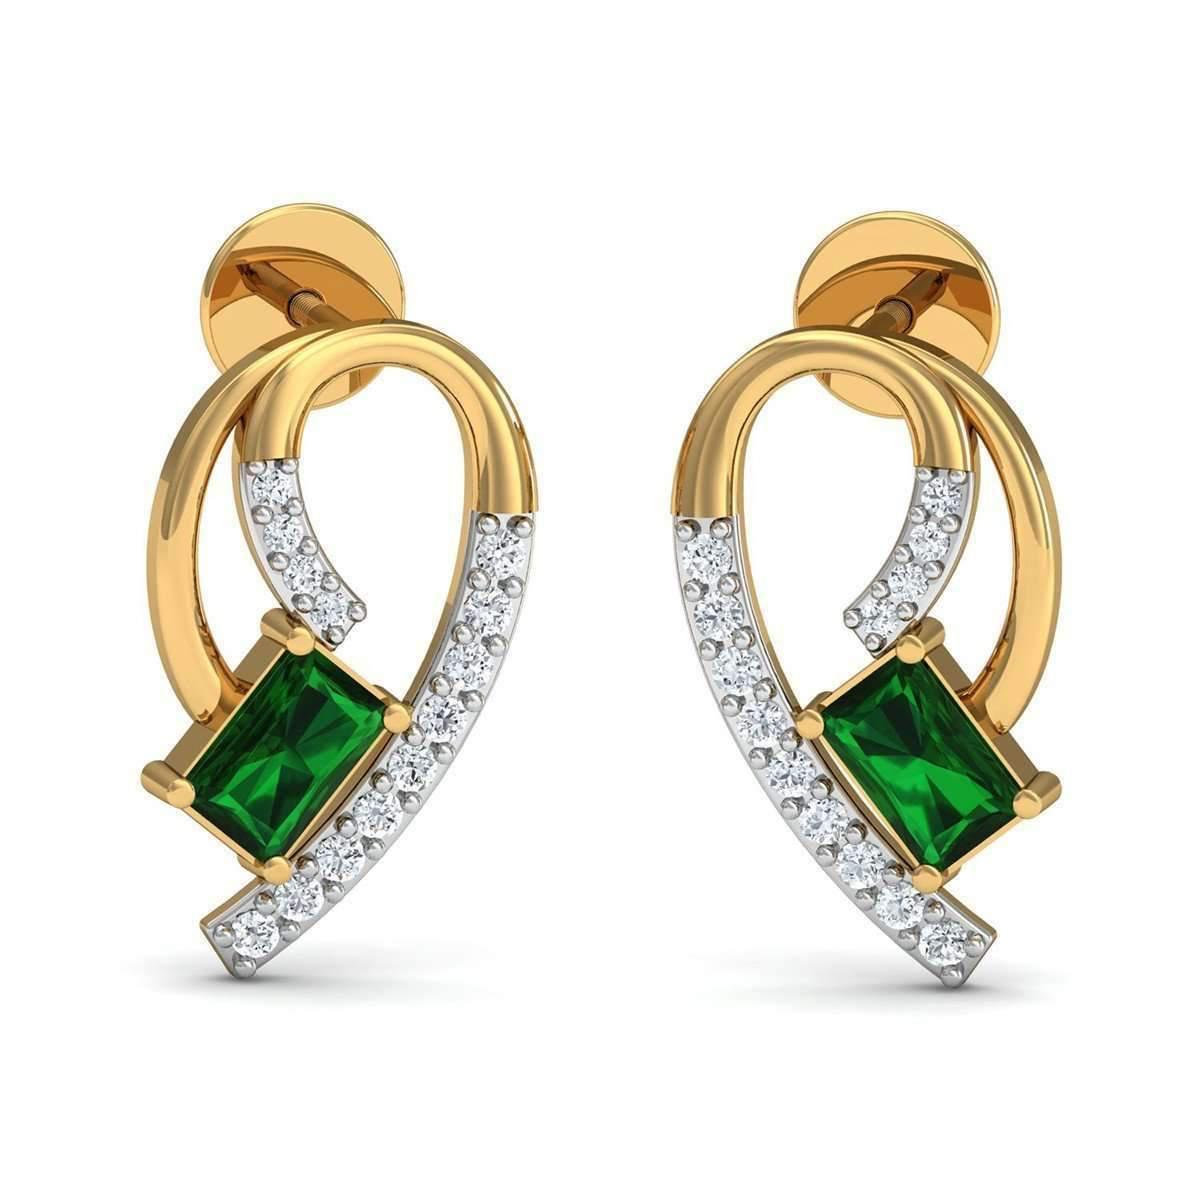 Diamoire Jewels Women S Metallic Nature Inspired Ruby And Premium Quality Diamond Earrings